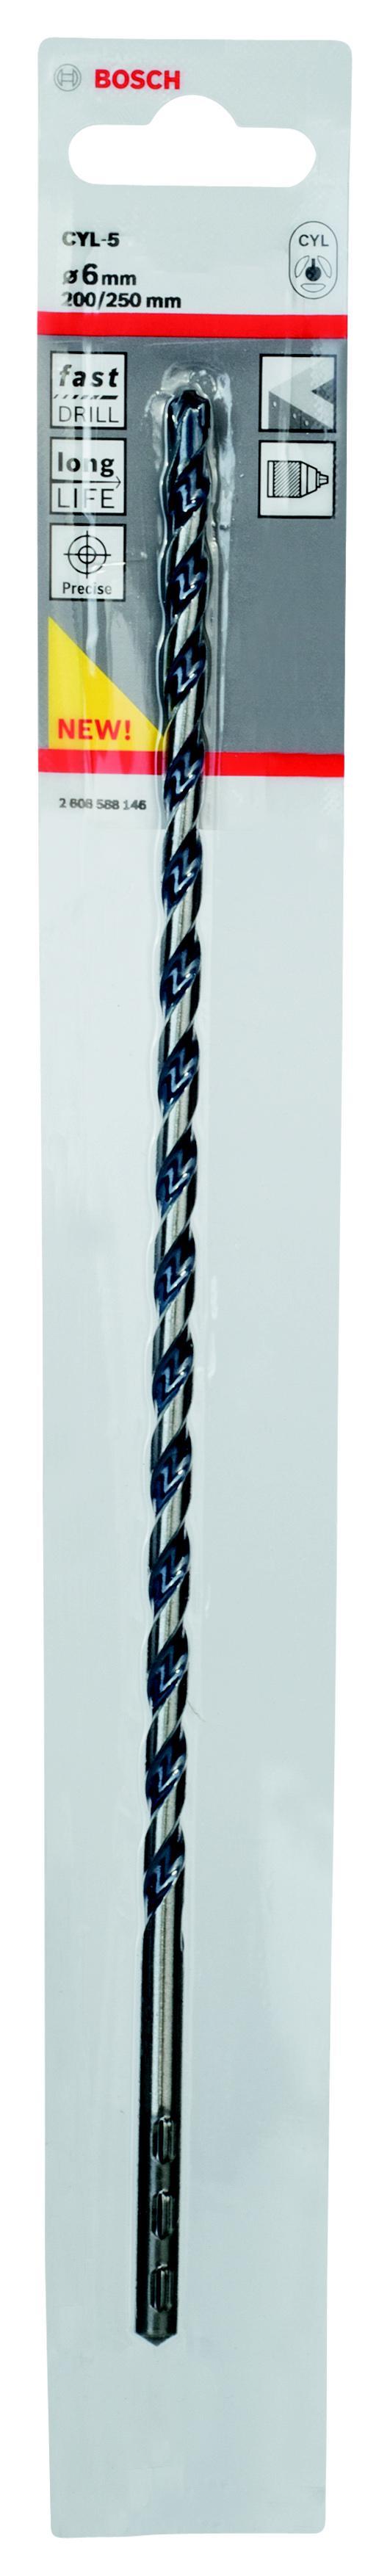 Сверло по камню Bosch Cyl-5 Ф6x200x250мм (2.608.588.146) сверло универсальное bosch cyl 9 multiconstr